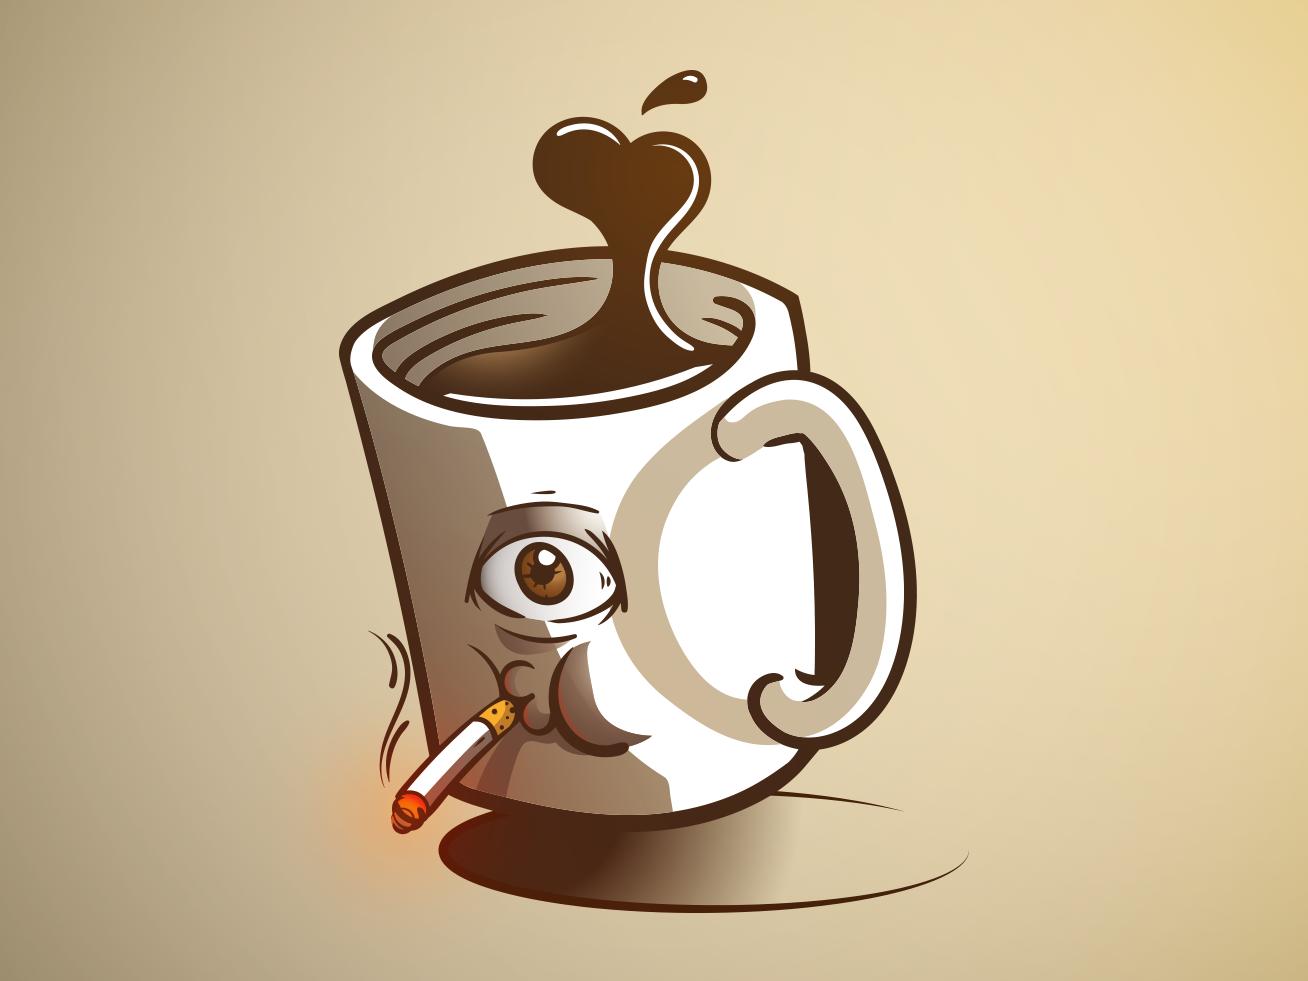 Smoking Mug coffee cup coffee smoking mug icon vector flat design design jtitogouveia graphic design illustration j.tito gouveia